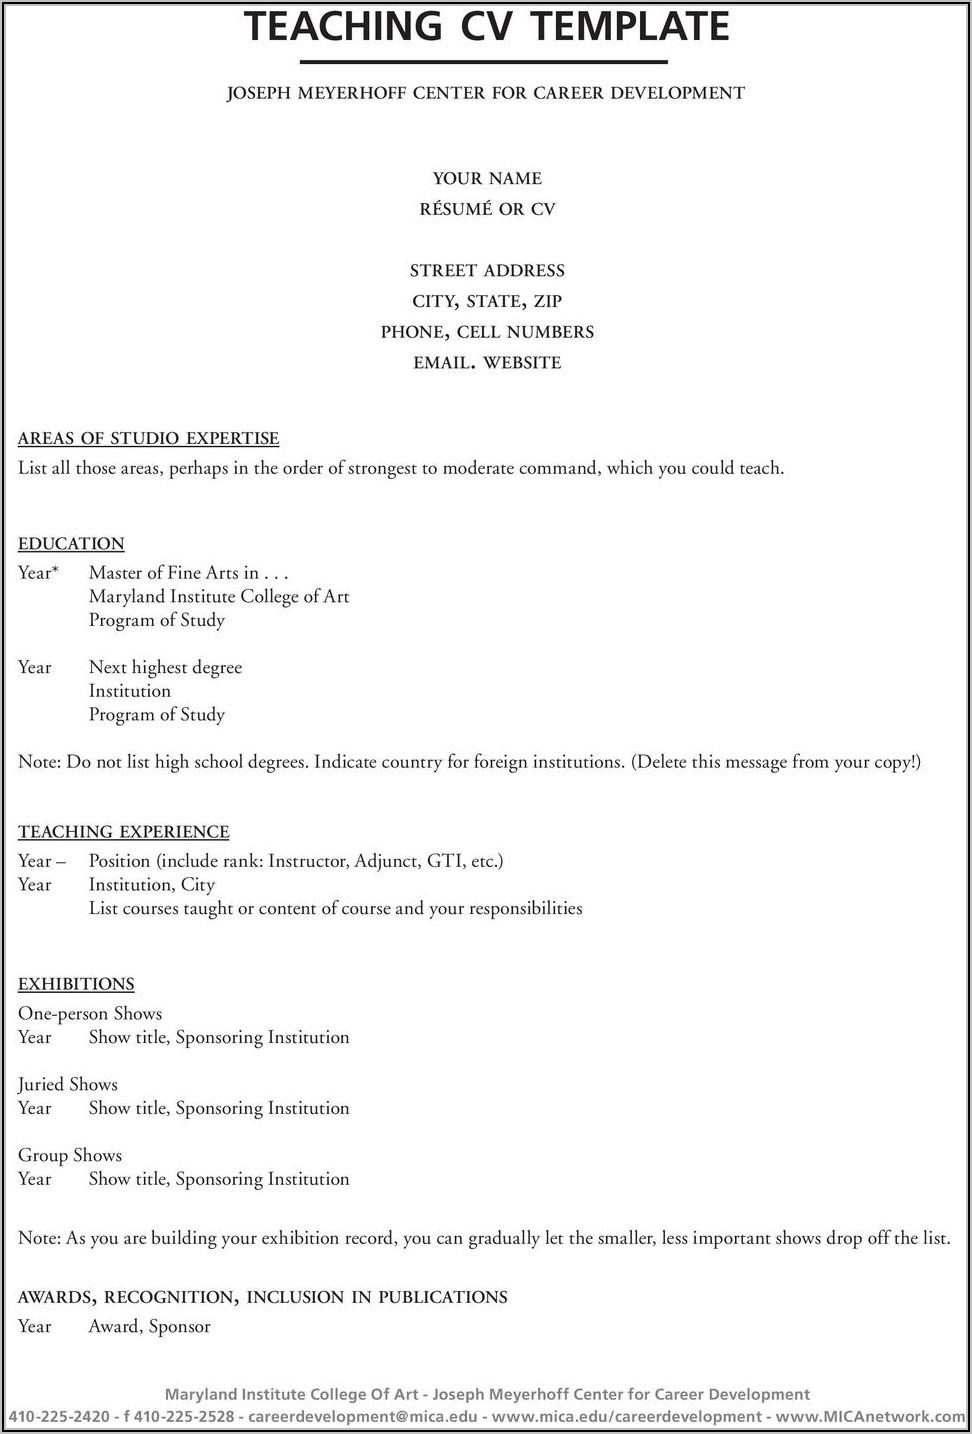 Free Teaching Cv Template Download